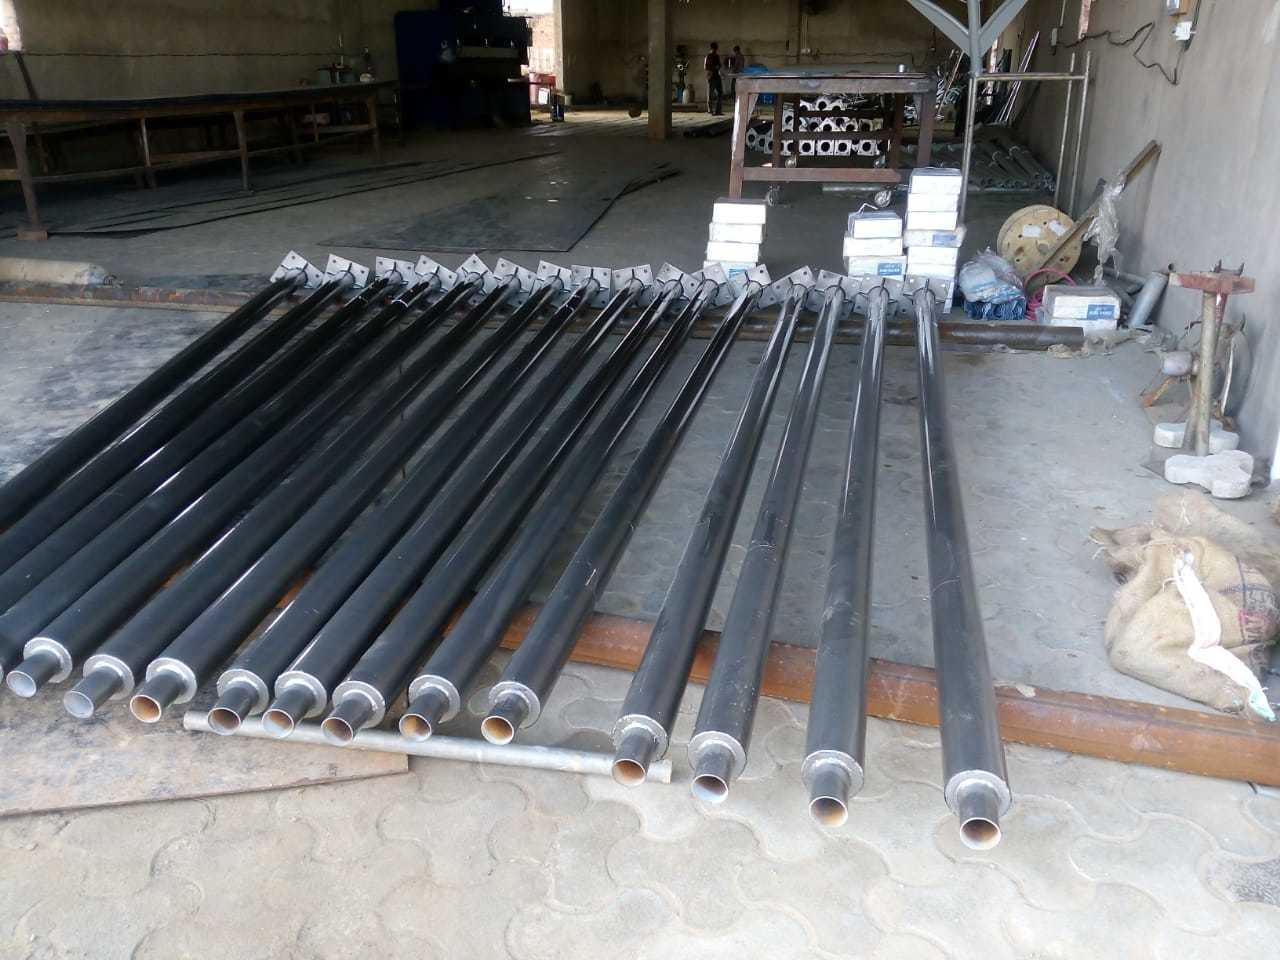 Pu Painted decorative tubular poles